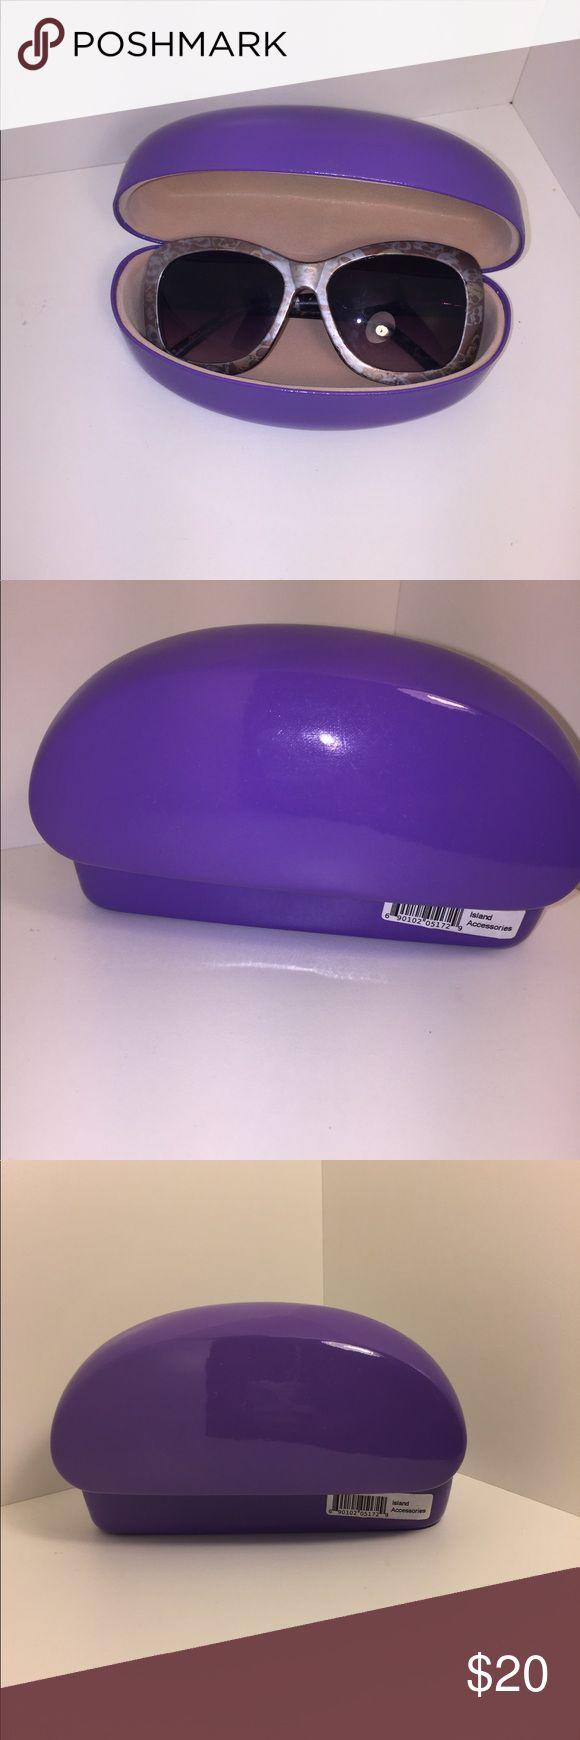 NWT Sunglasses Purple Case Cute Vinyl XL Sunglasses Case New in this gorgeous Violet/Purple Color Accessories Sunglasses